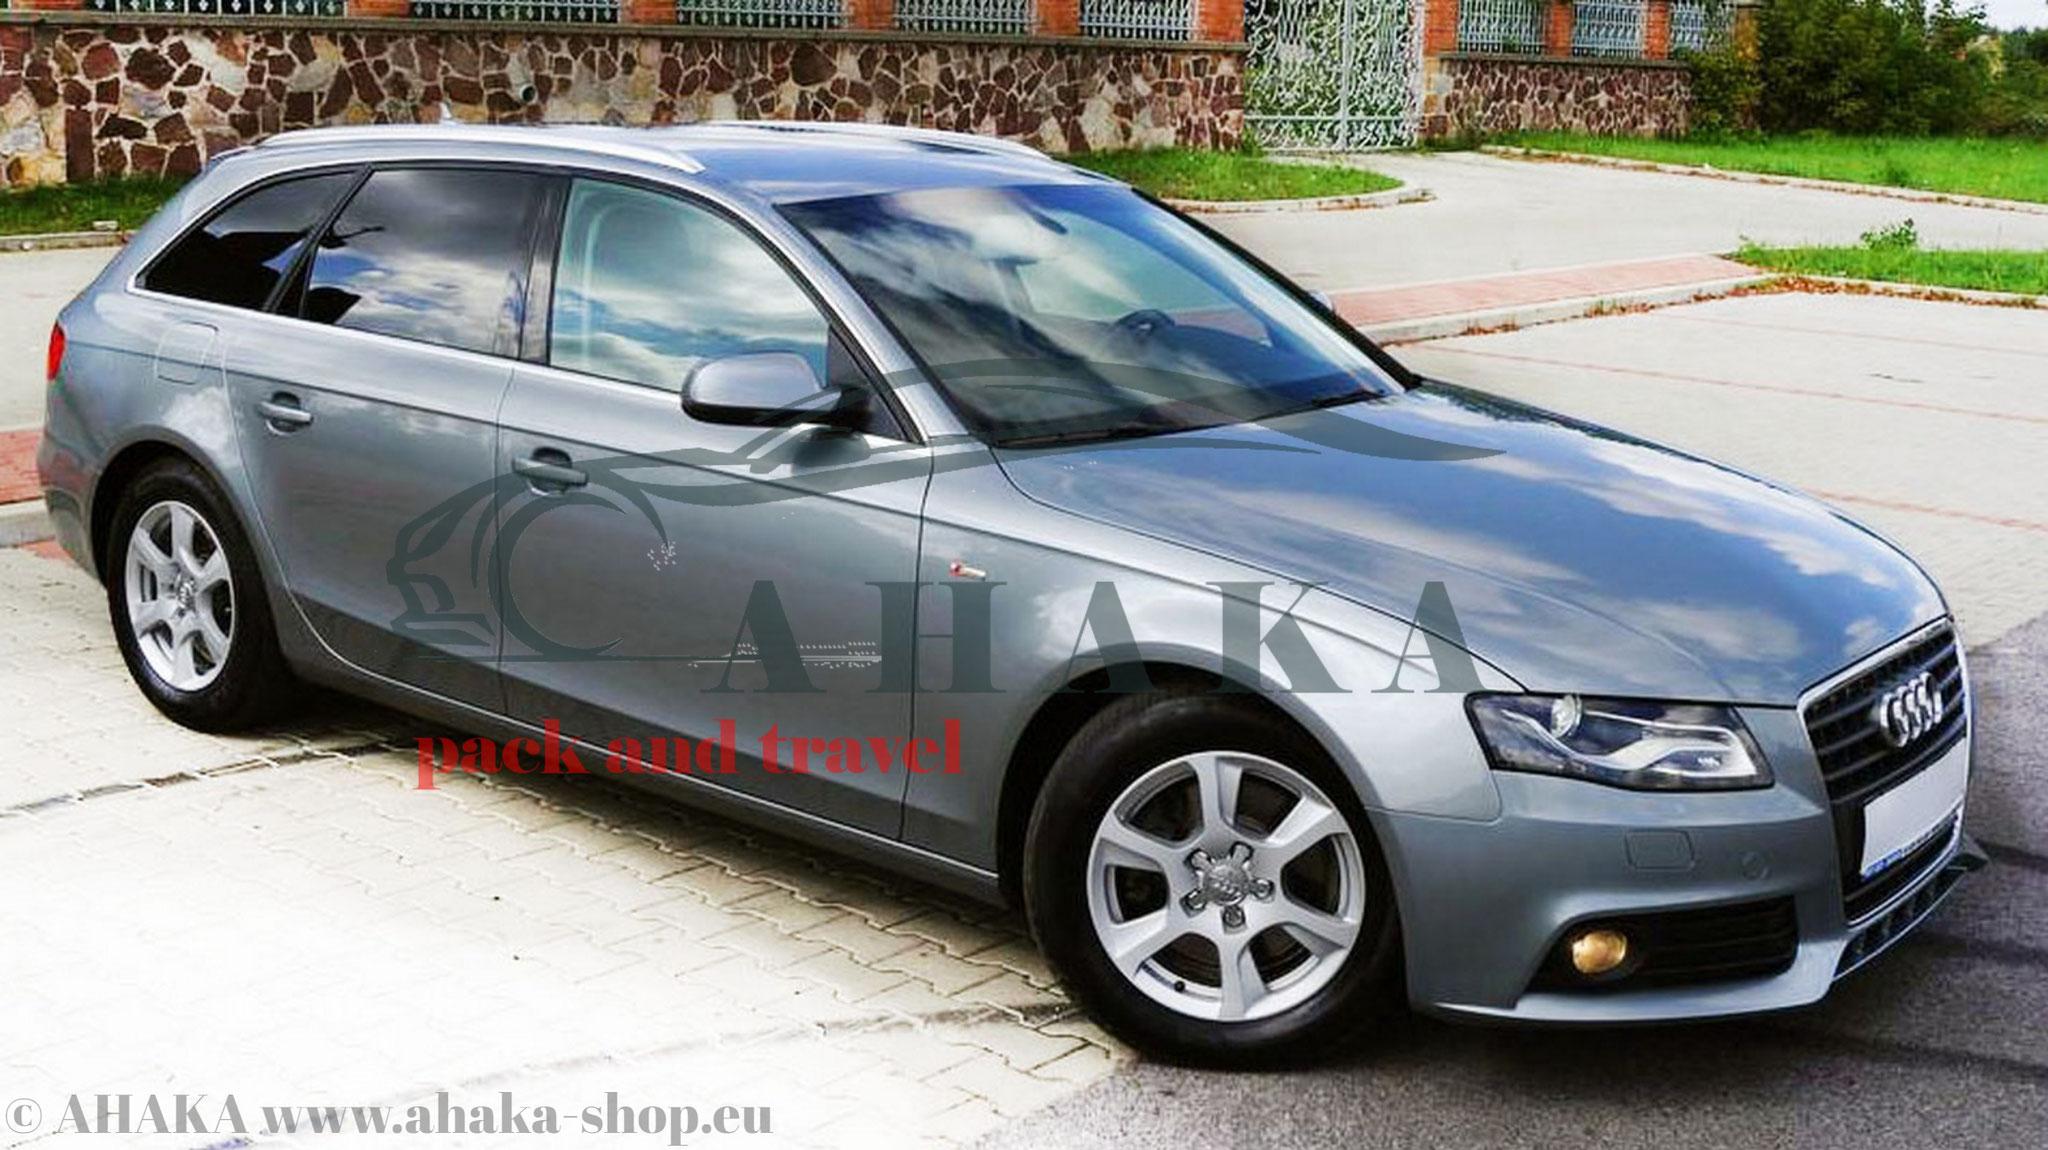 Audi A4 S4 Anhängerkupplung Online Kaufen Ahaka Onlineshop